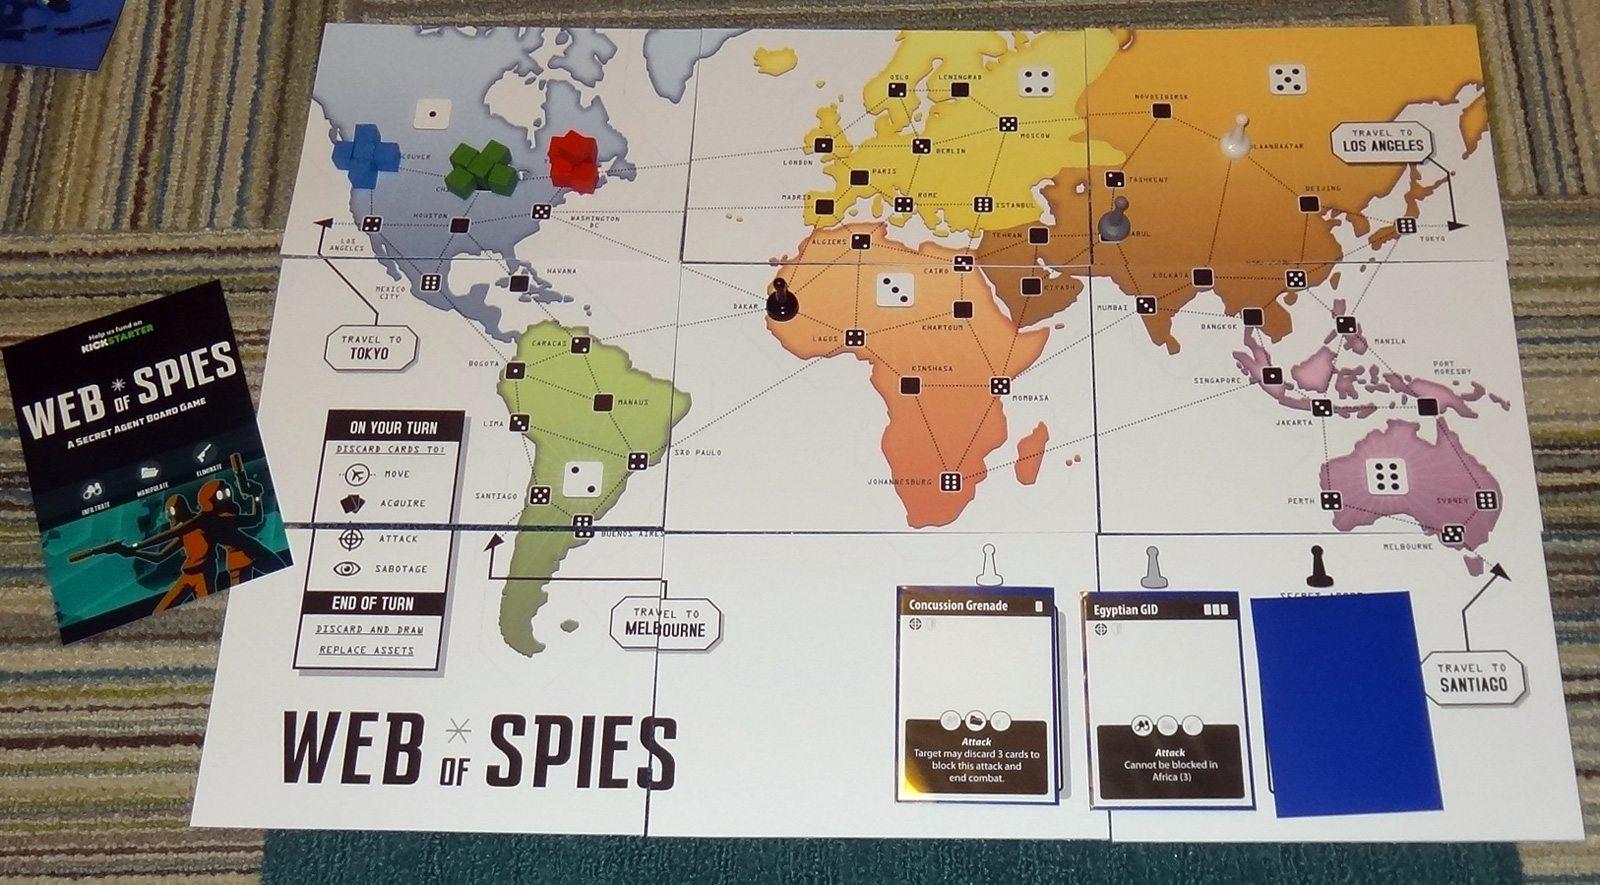 Web of Spies board